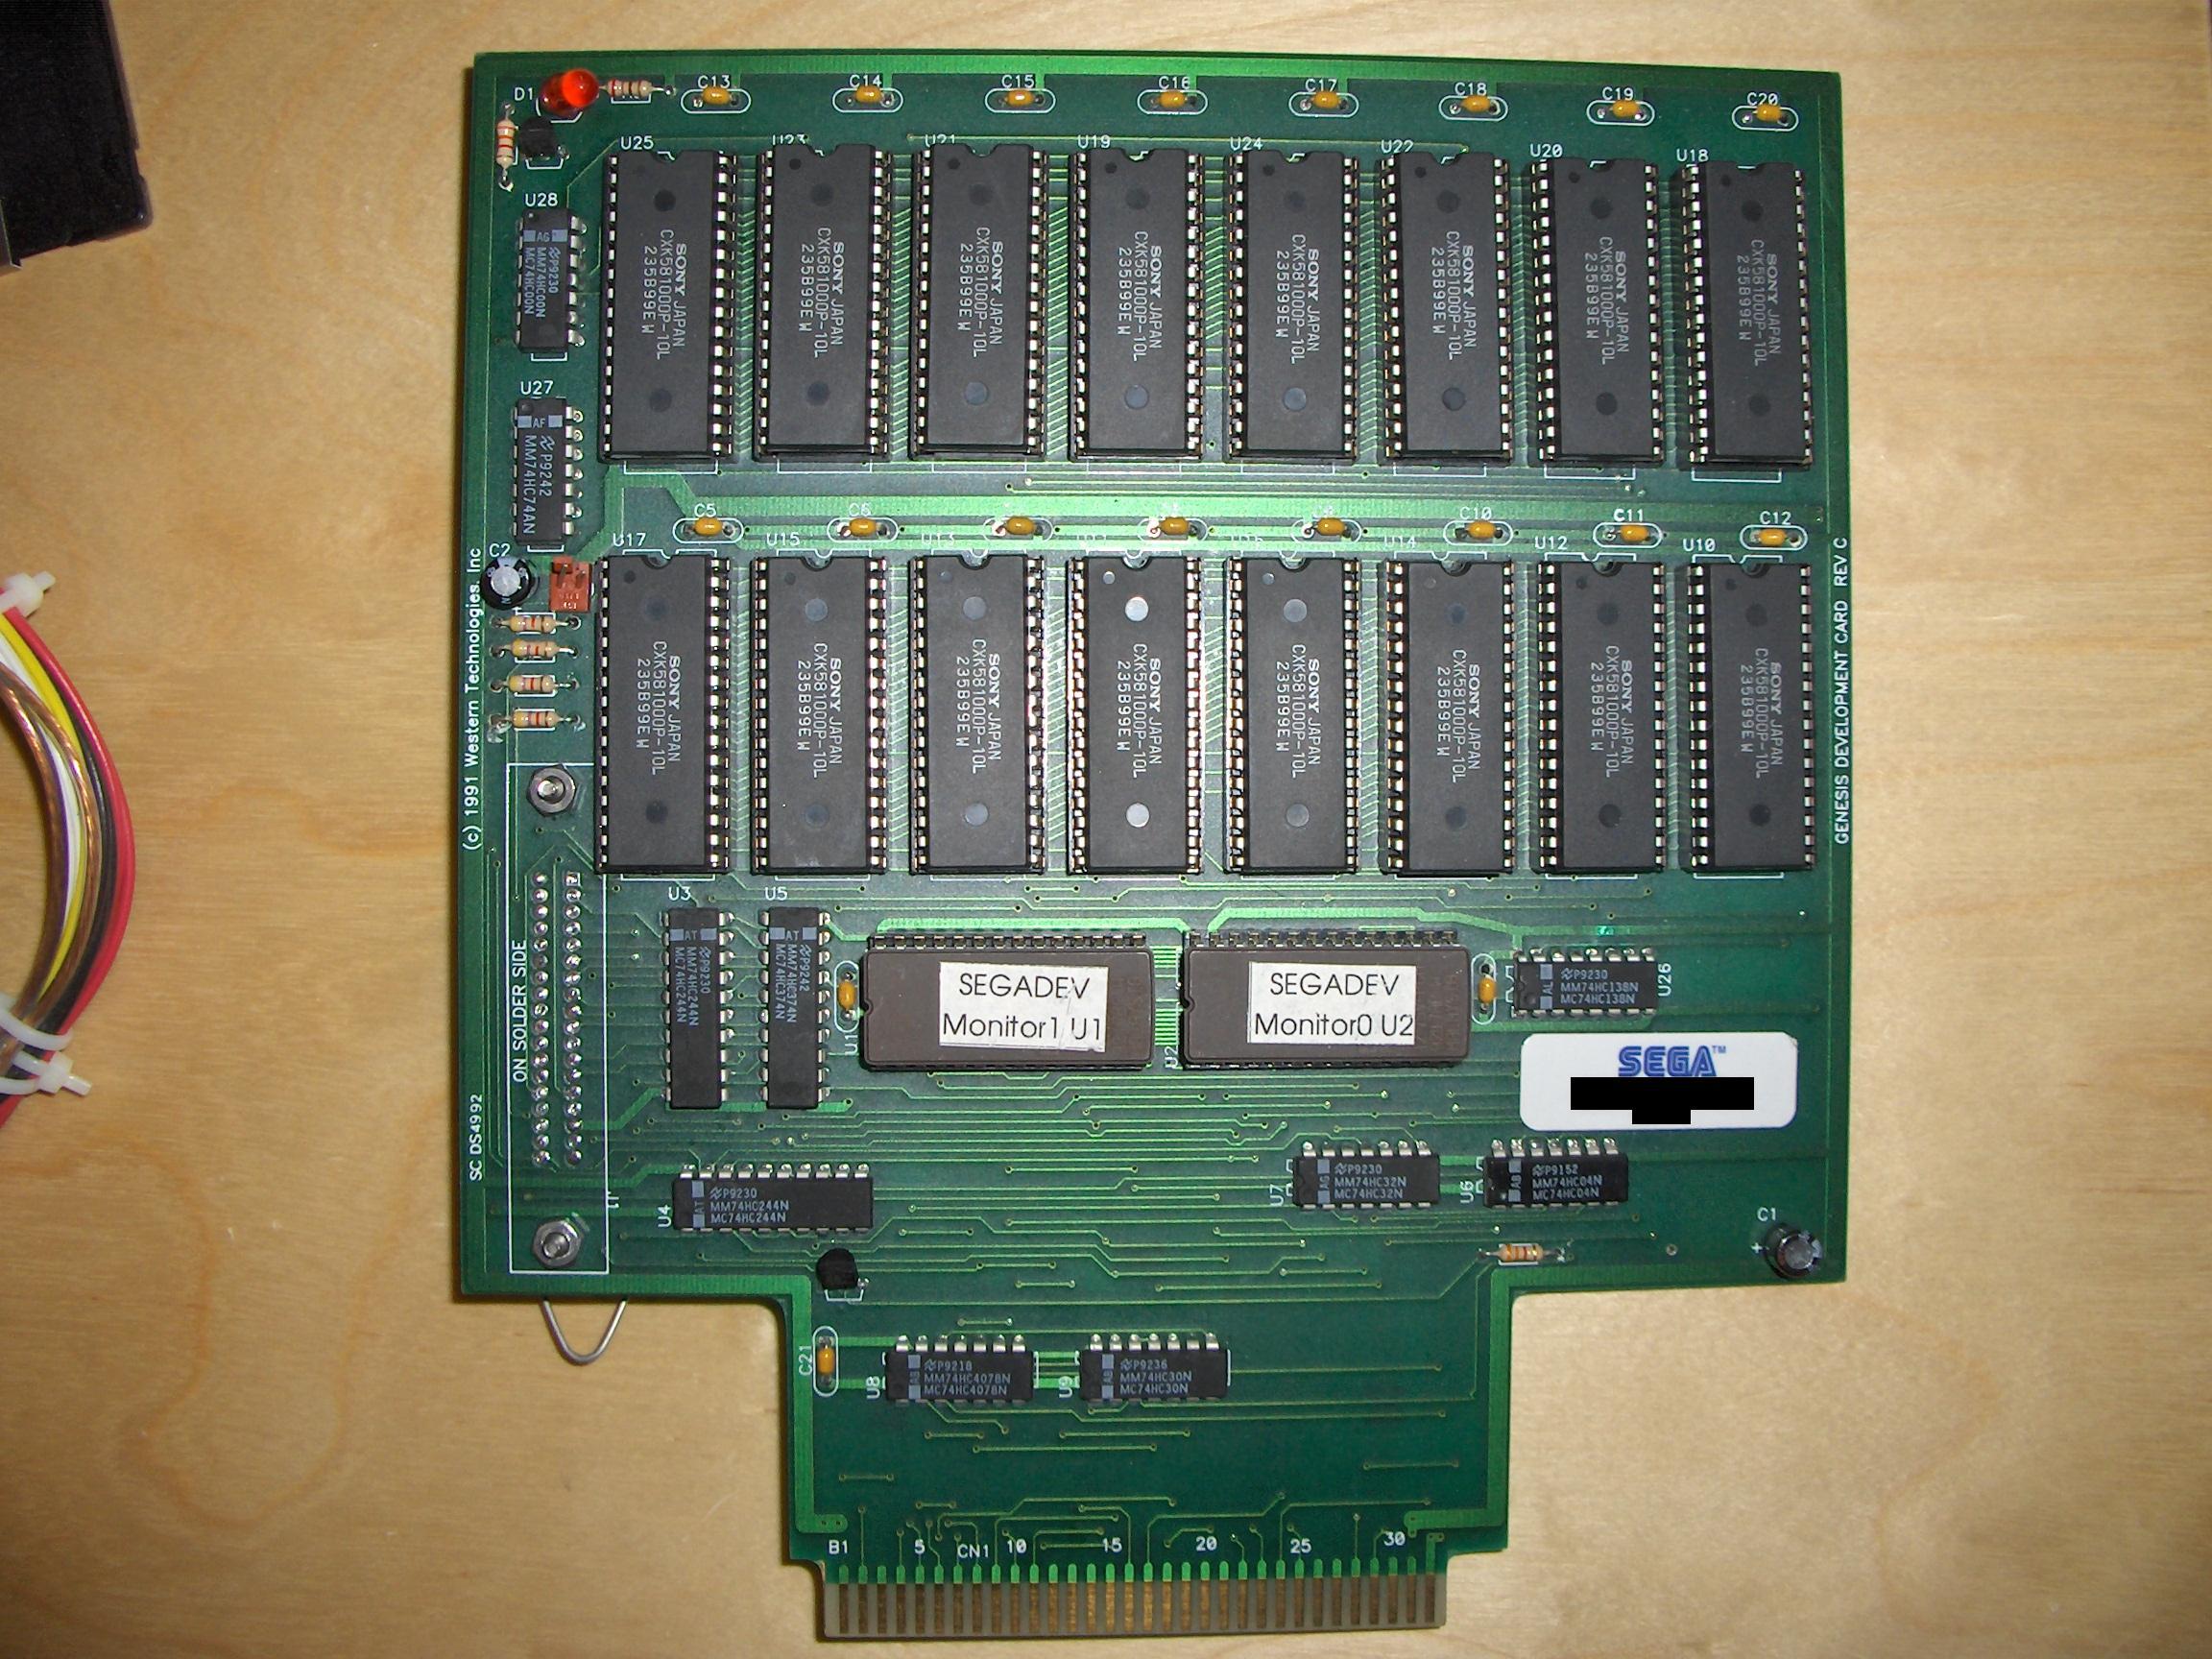 Console/SegaMegaDrive/Pictures/WesternTechnologies.jpg